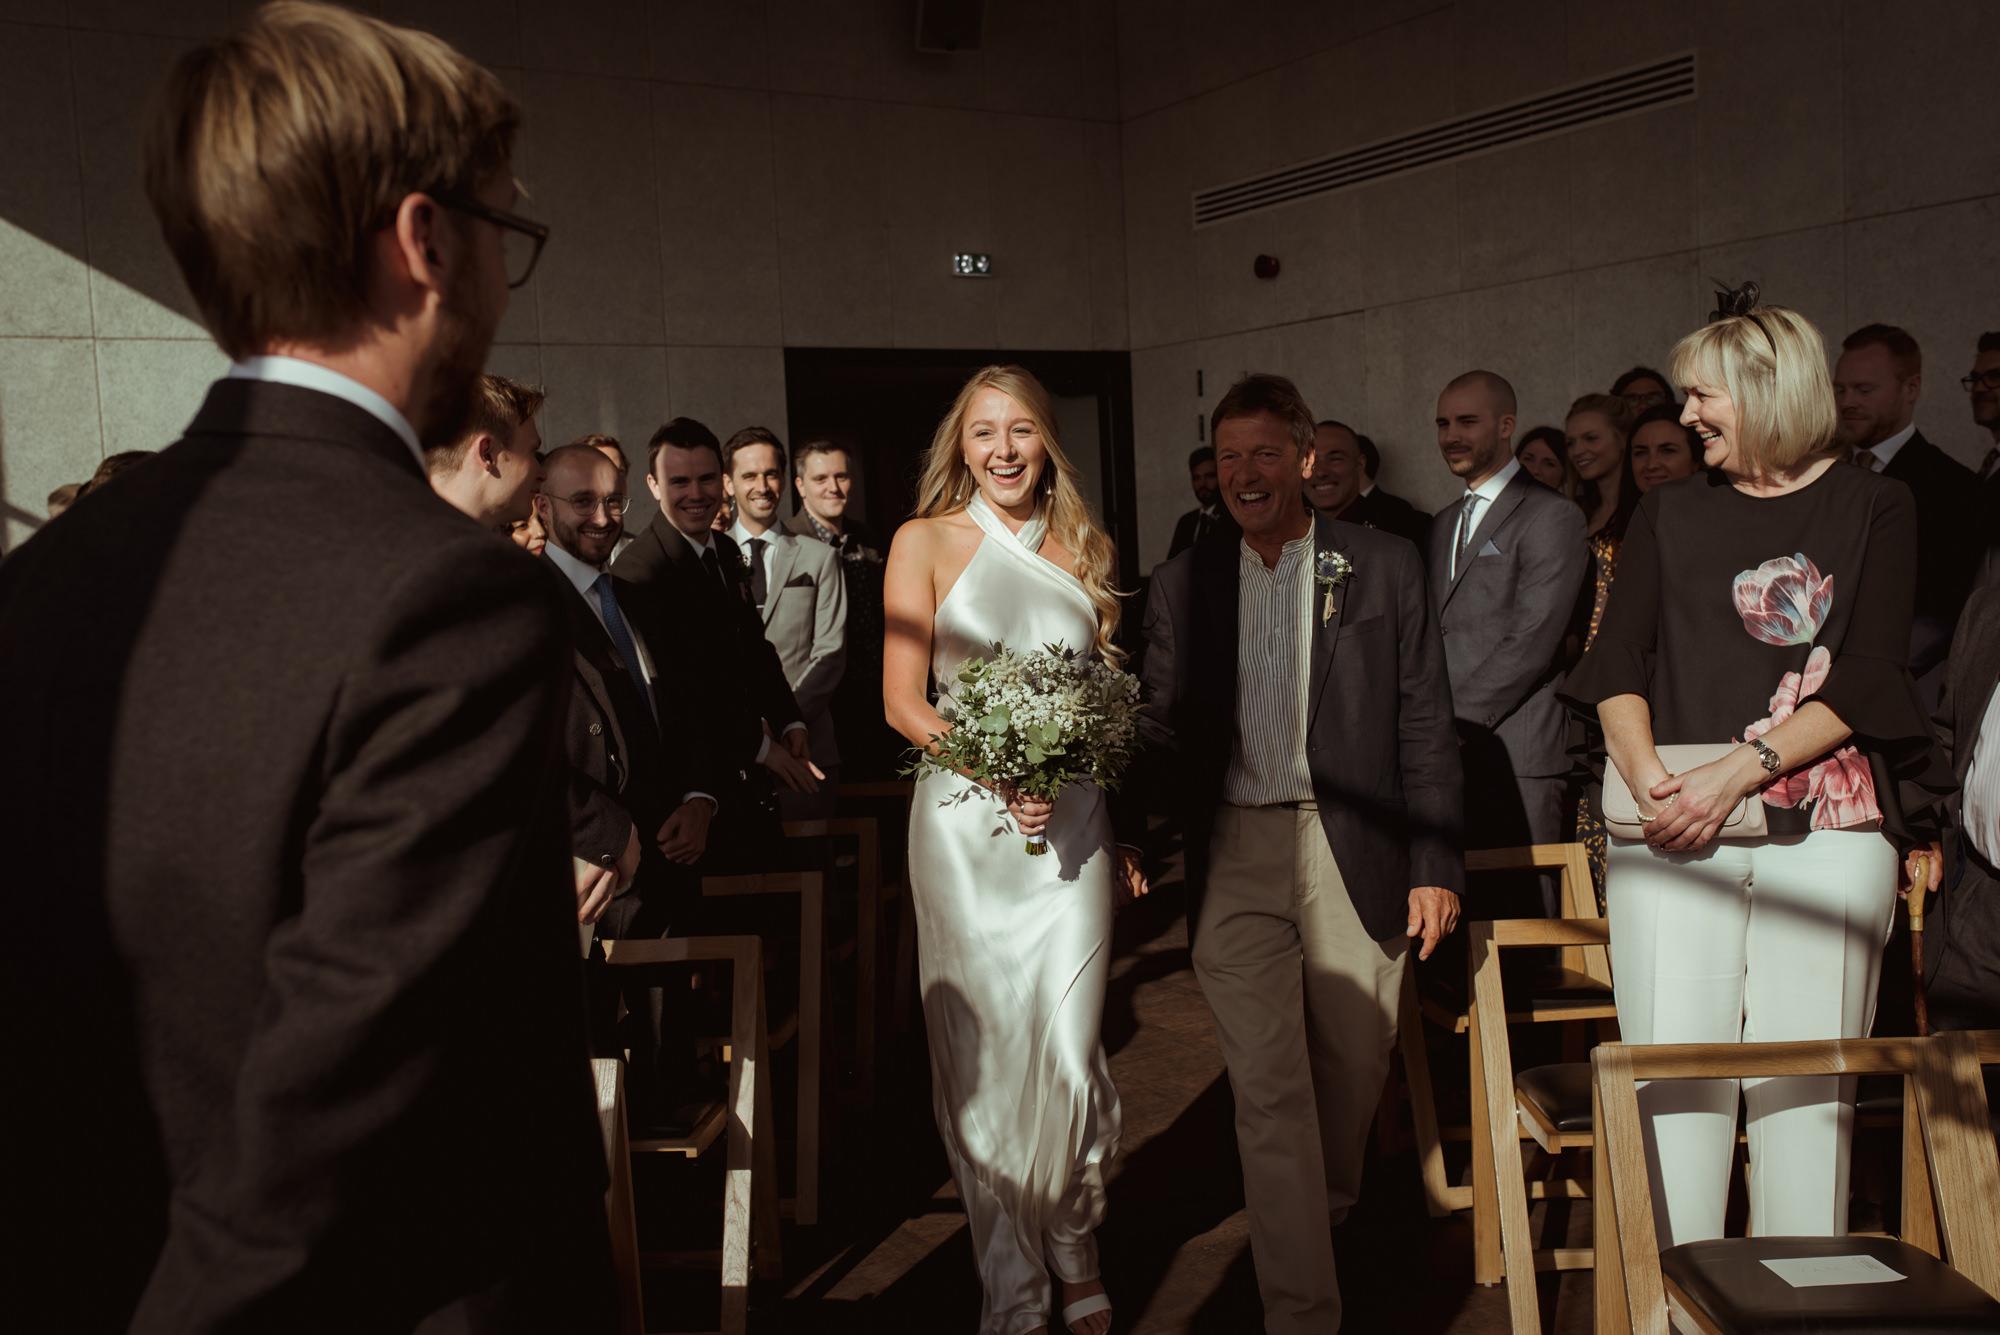 trendy-wedding-venues-shoreditch.jpg